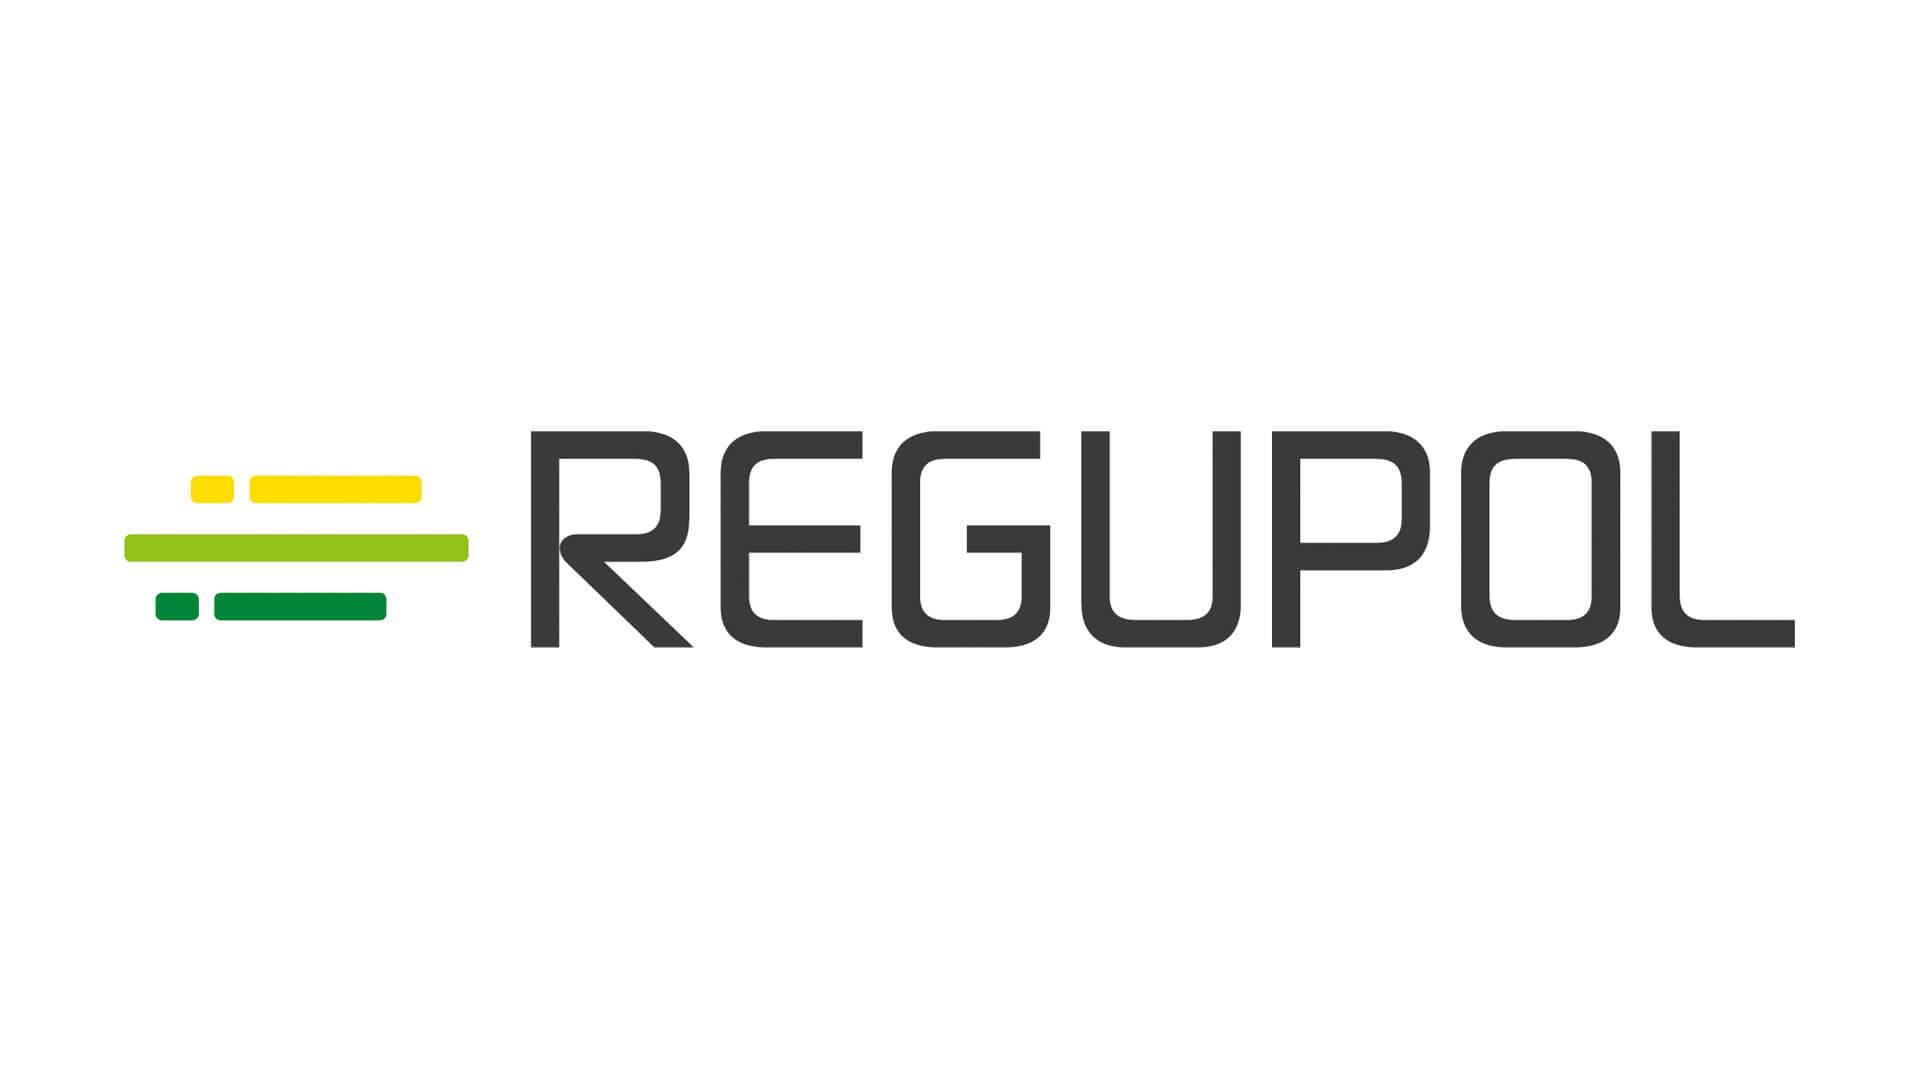 regupol-logo-uebersicht